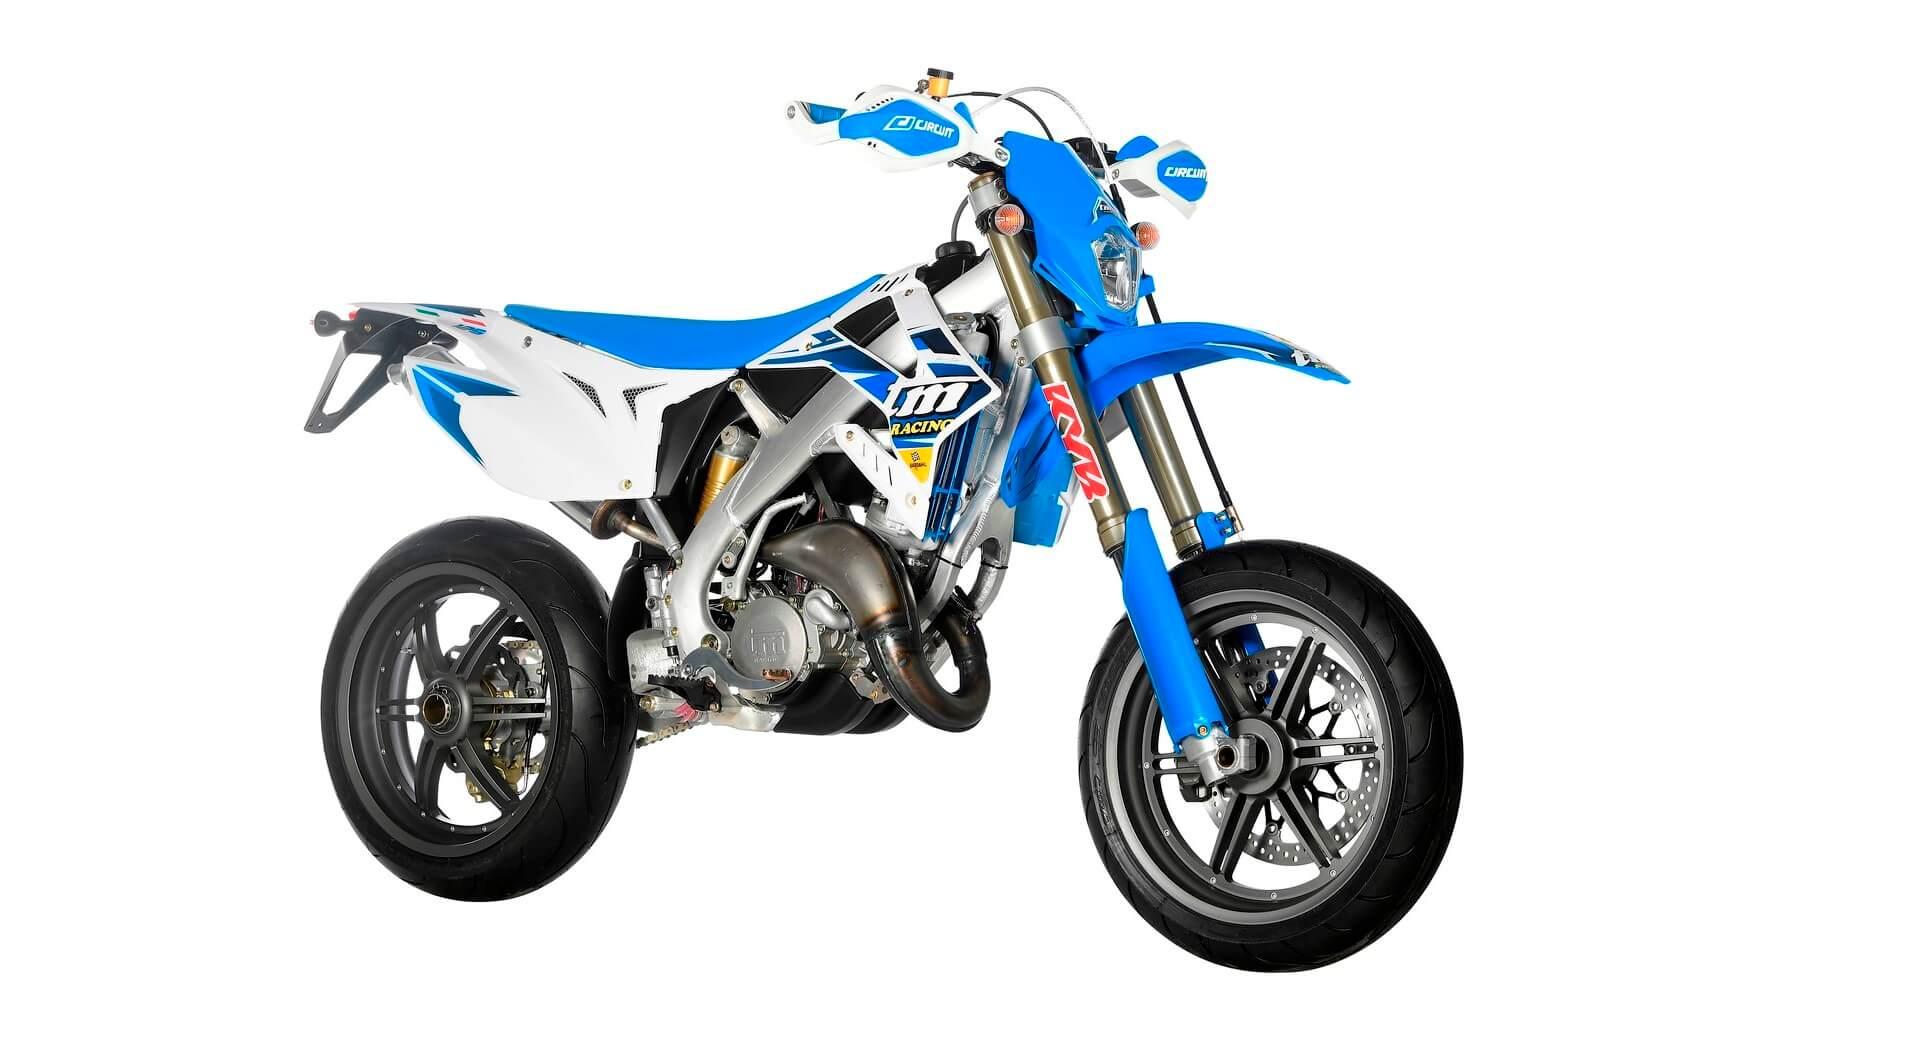 tm-racing TM RACING SMM 300 2T Motorcycle - Sport Collette